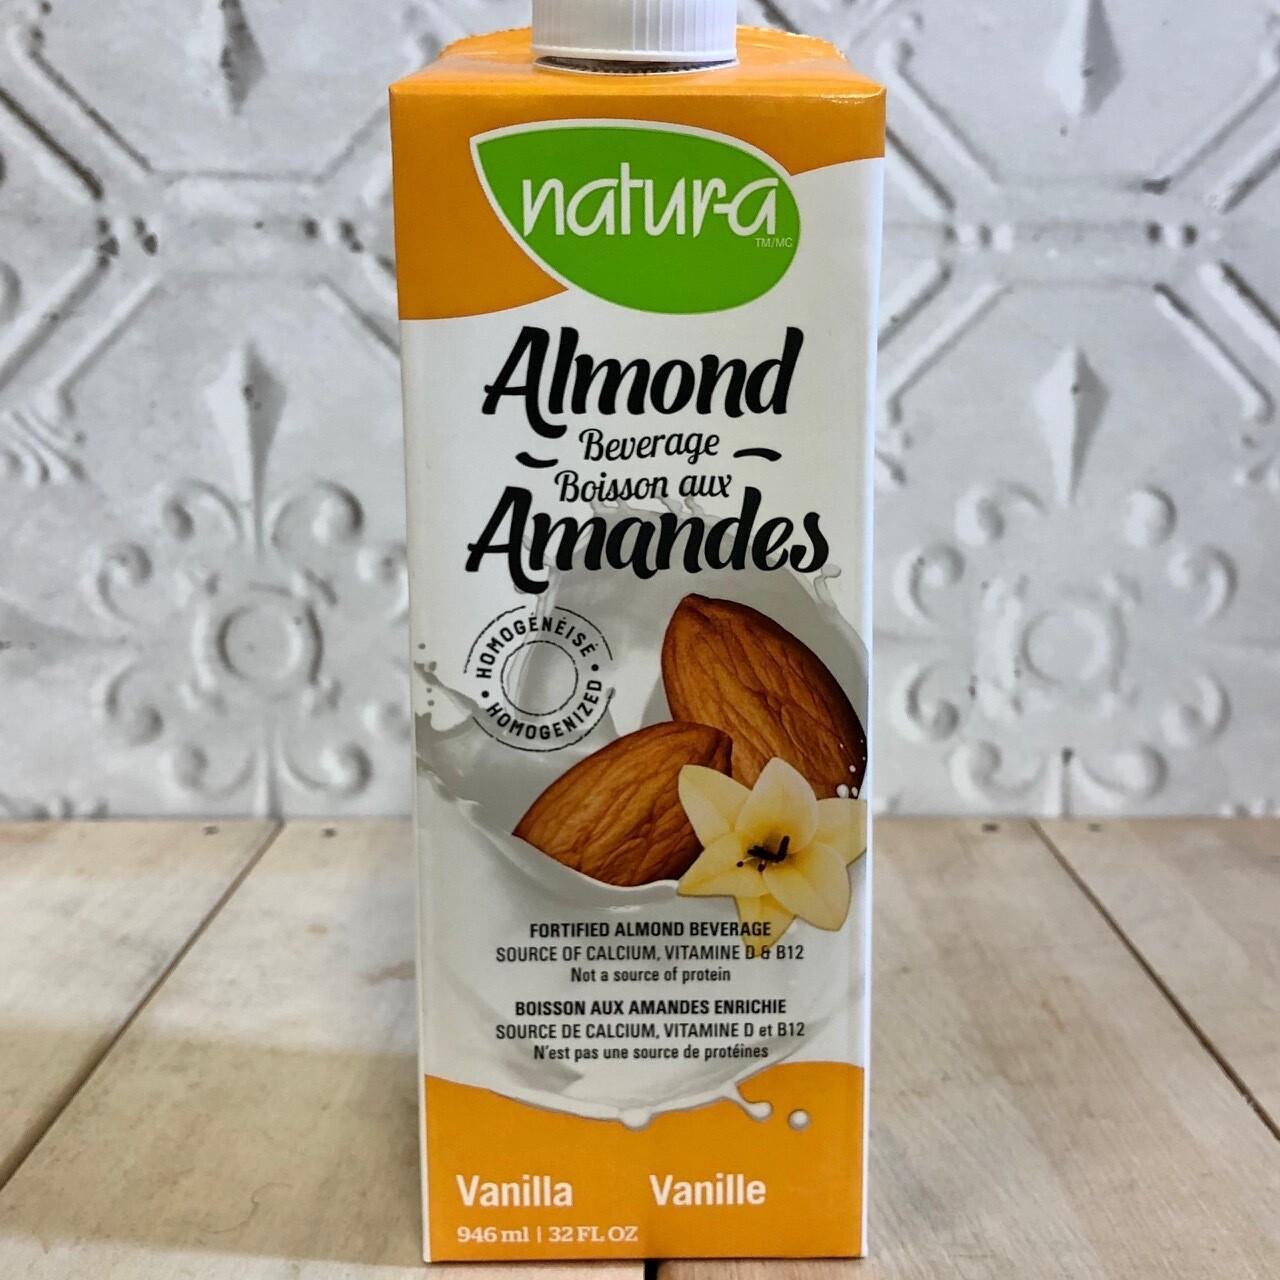 NATURA Almond Beverage Vanilla 946ml